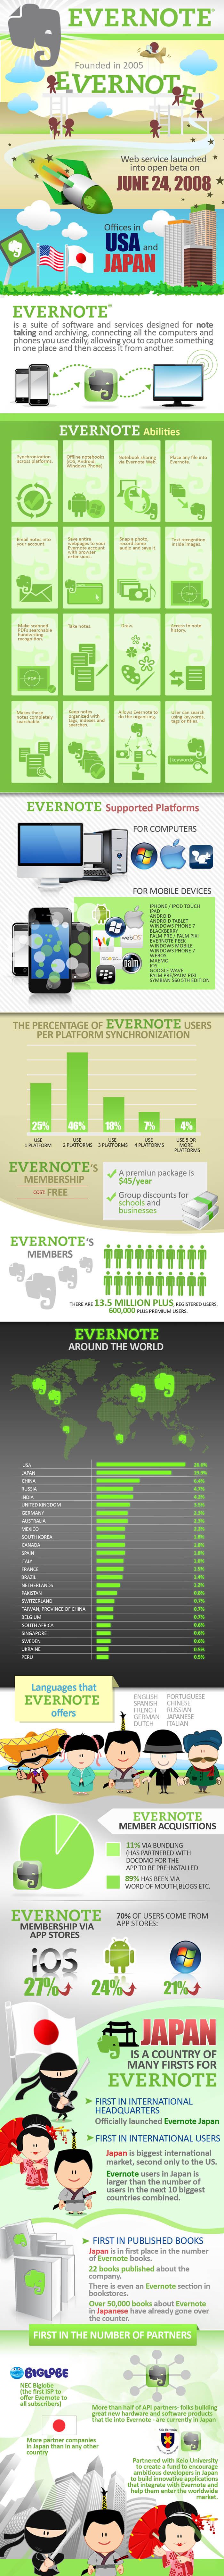 Evernote_infographie